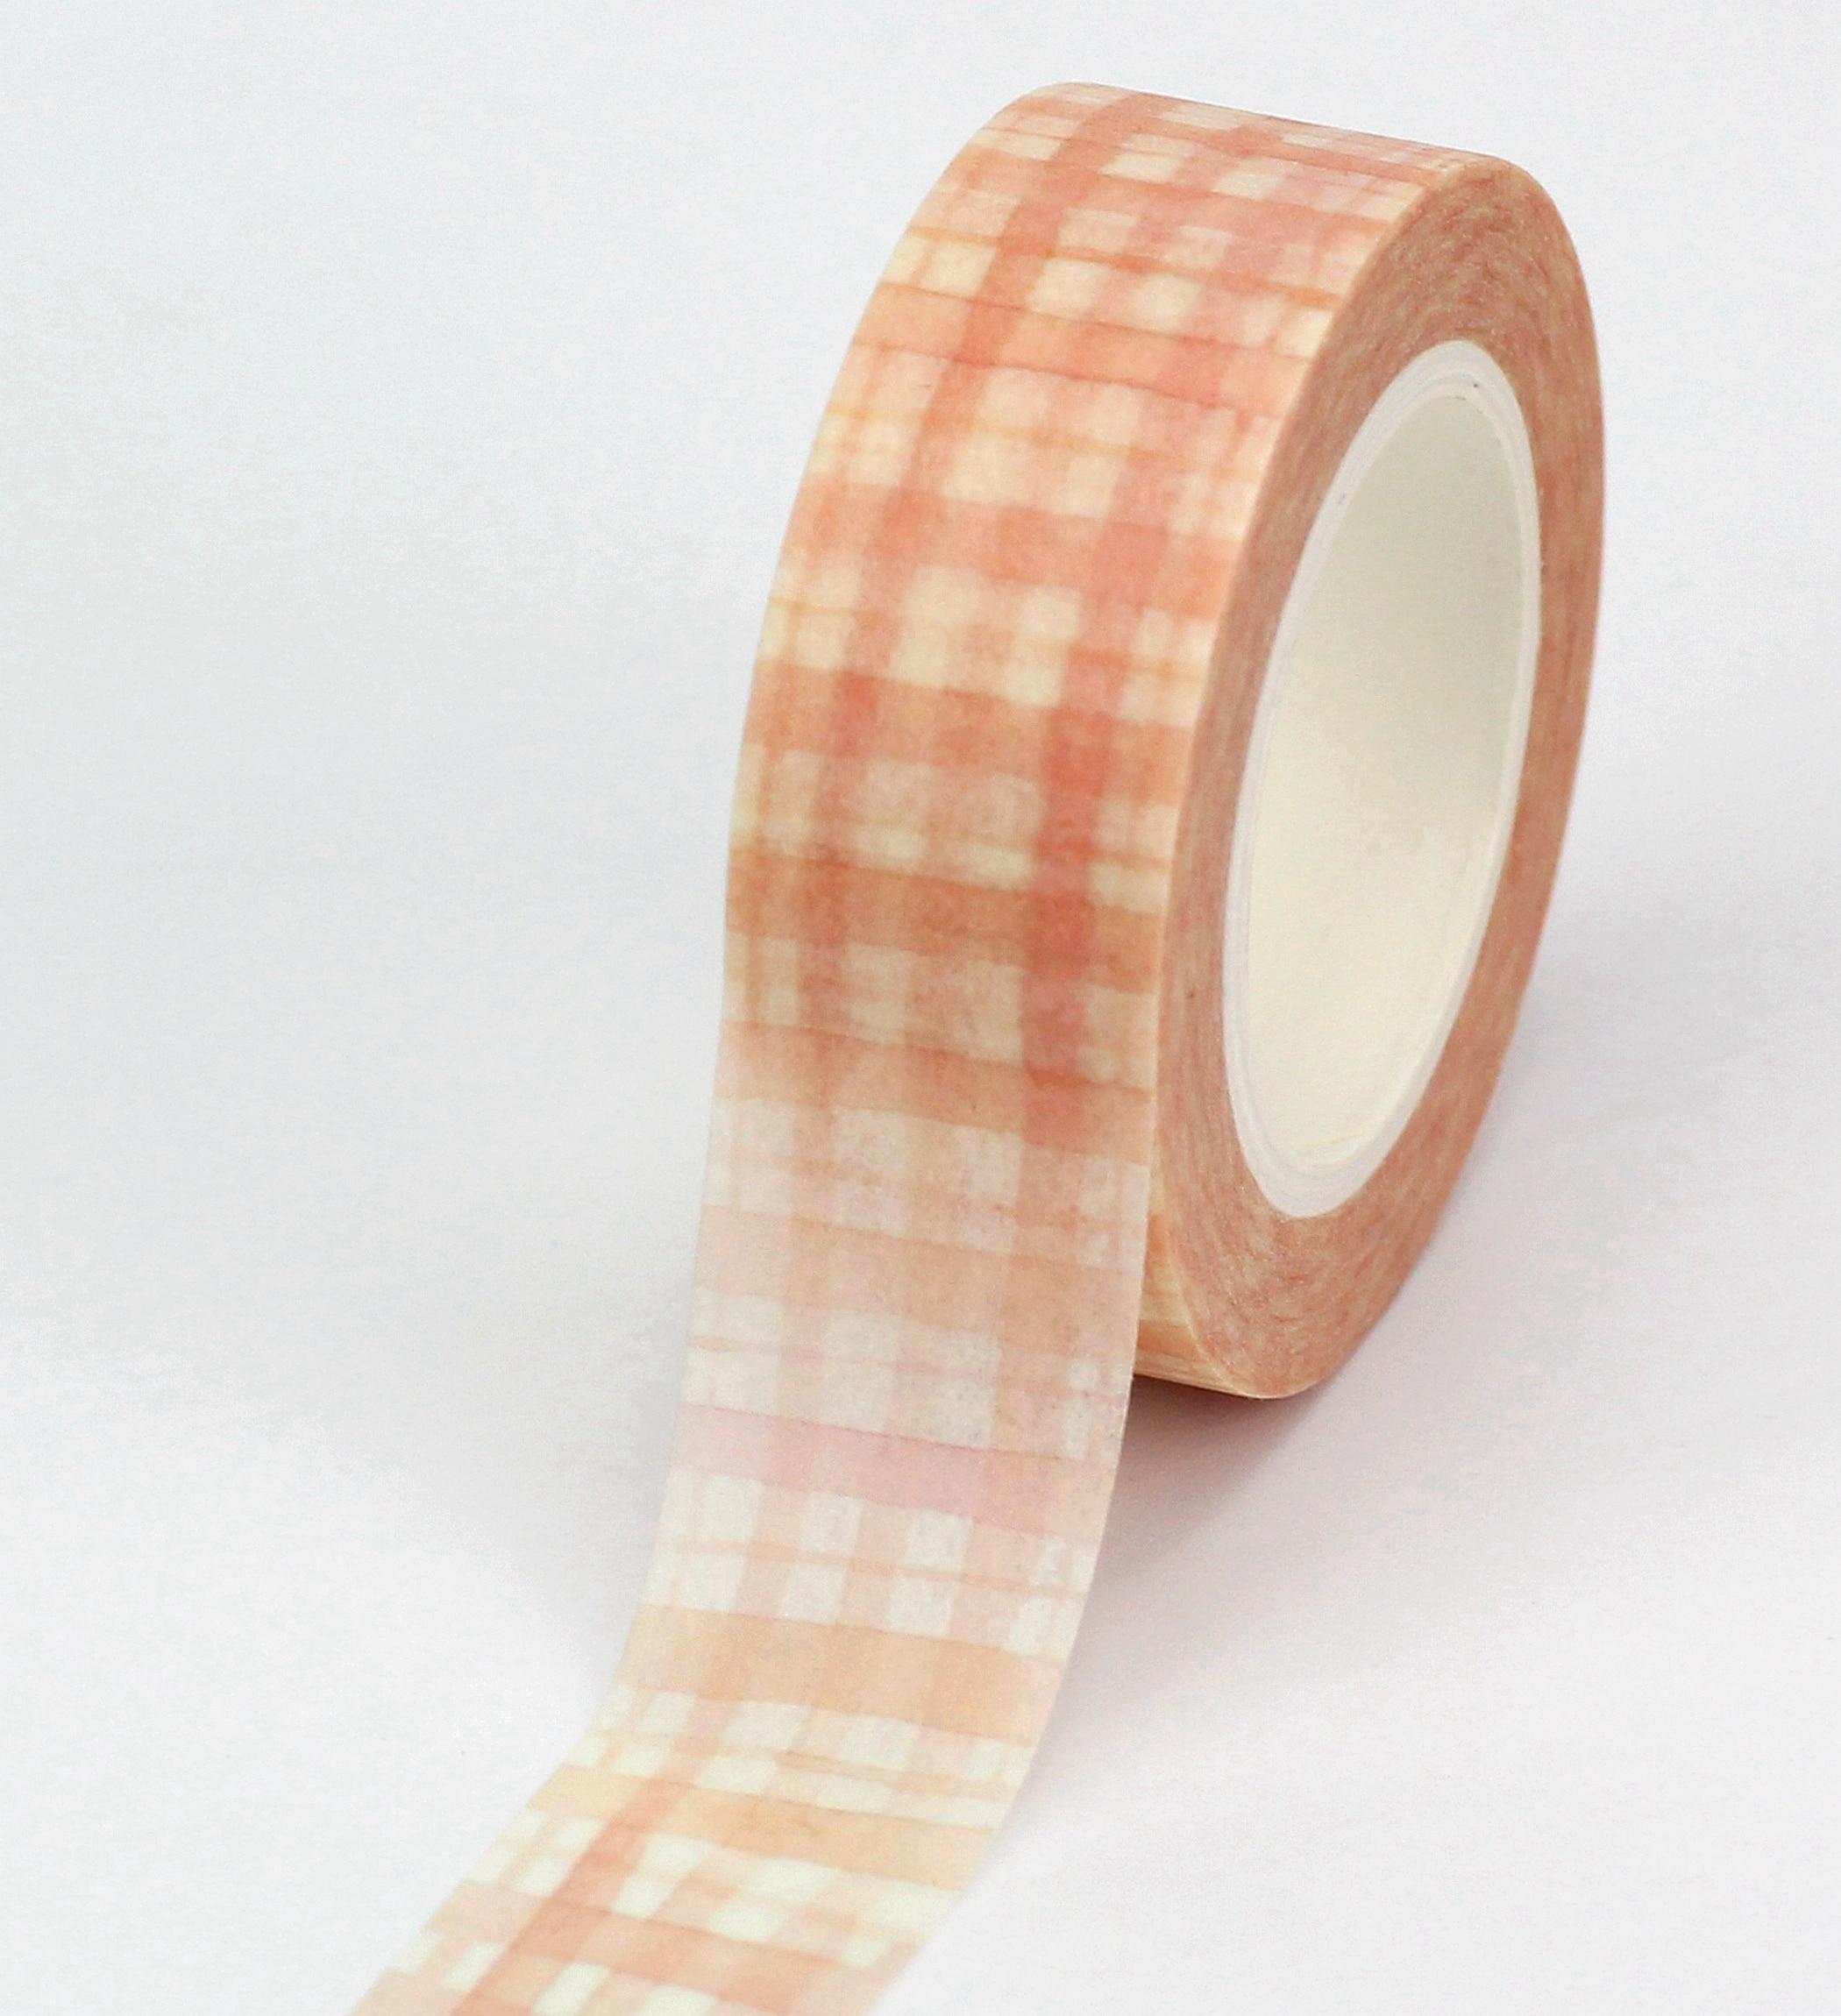 10pcs/lot Decorative Cute Fall Plaid Washi Tapes Paper DIY Scrapbooking Planner Adhesive Masking Tapes Kawaii Stationery